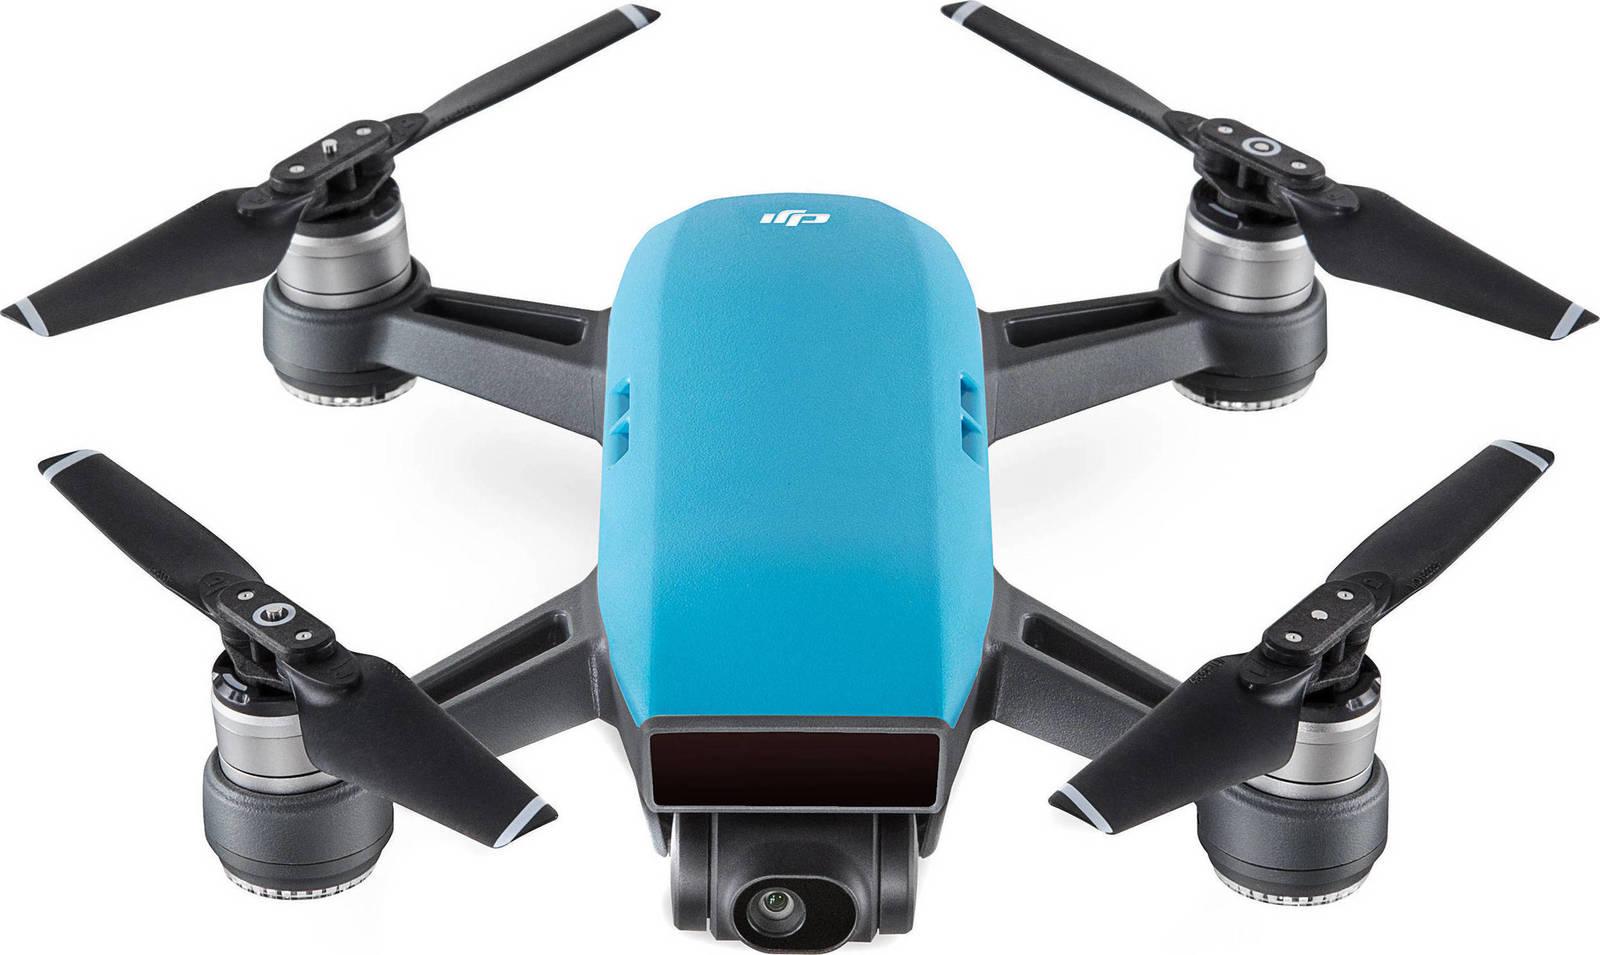 DJI Spark Drone Sky Blue Πληρωμή έως 12 δόσεις